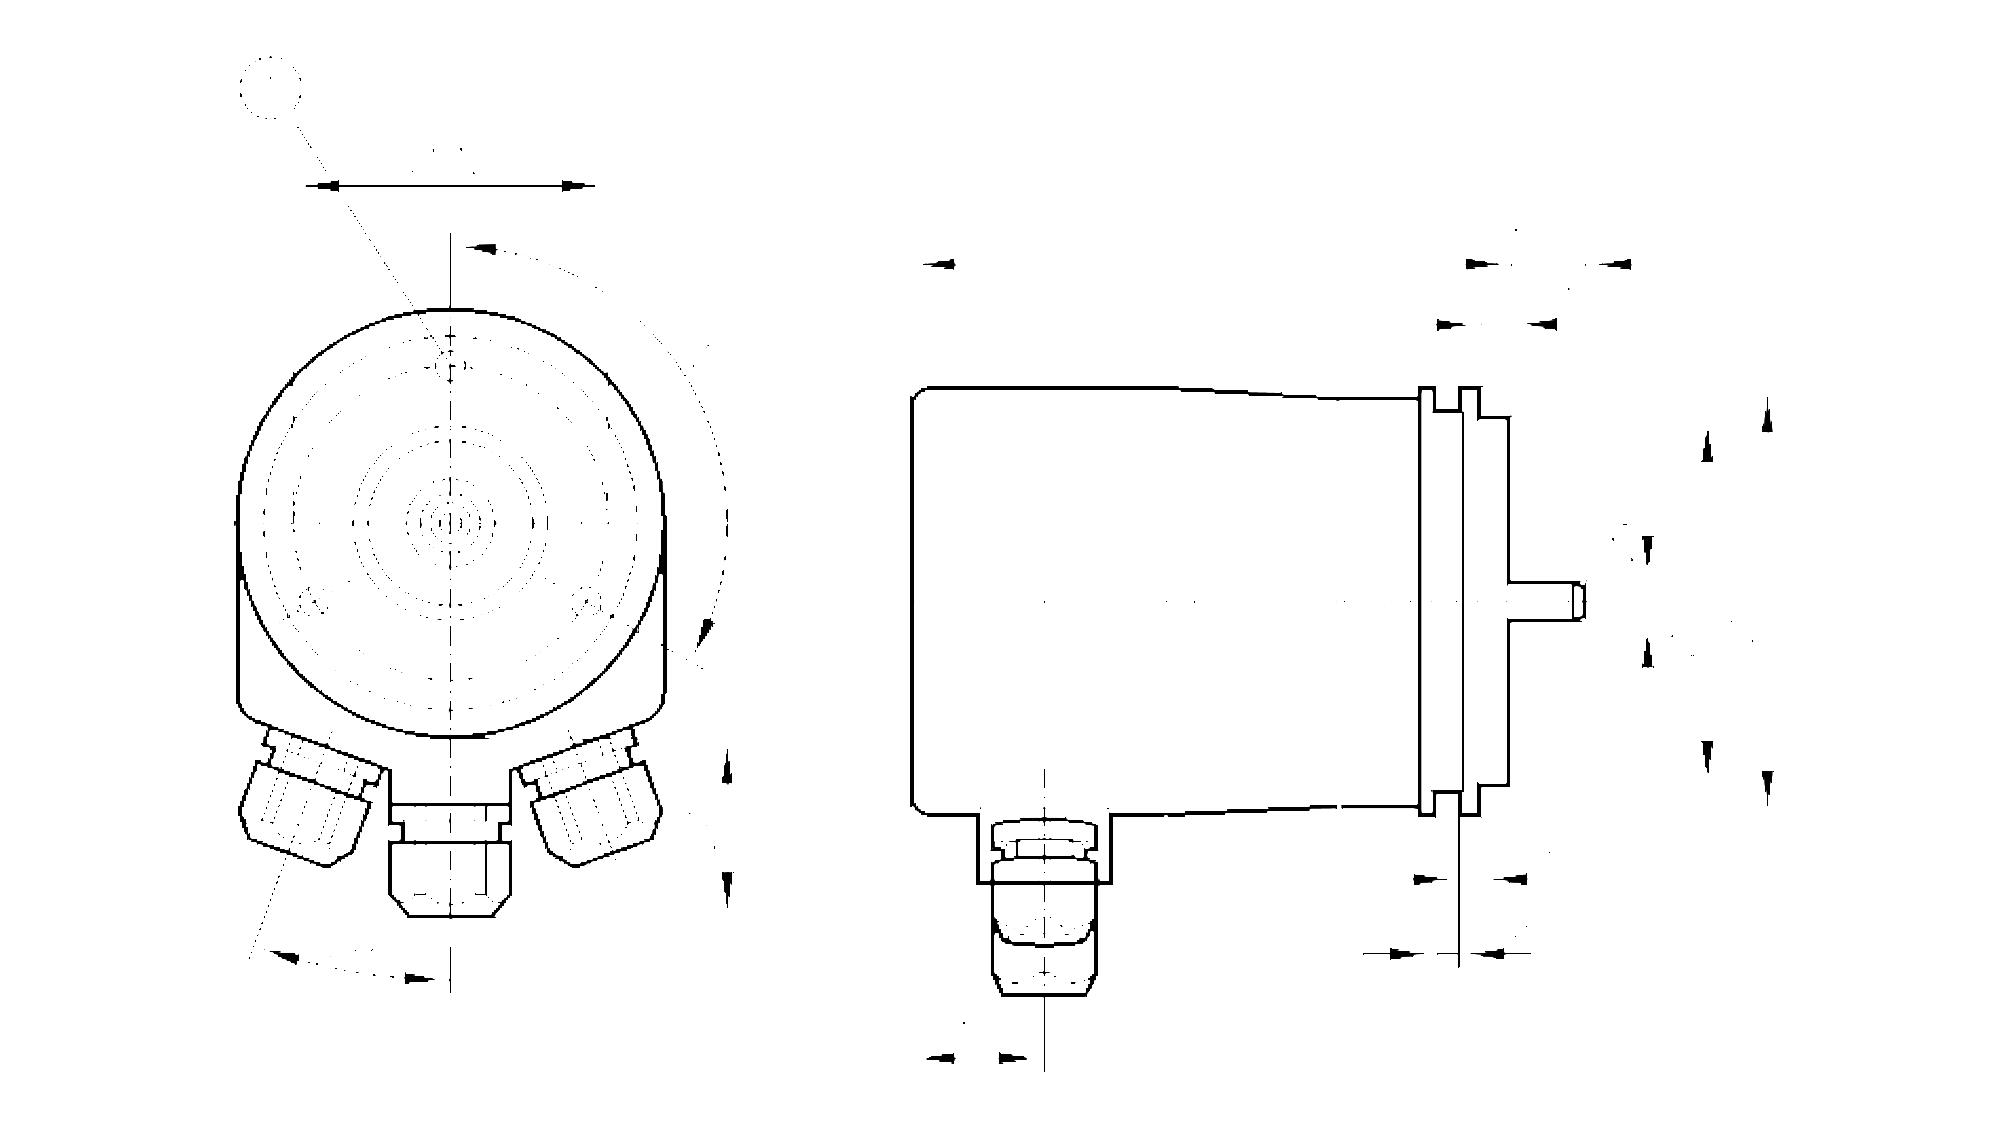 rm7003 - codeur multi-tours absolu  u00e0 arbre plein